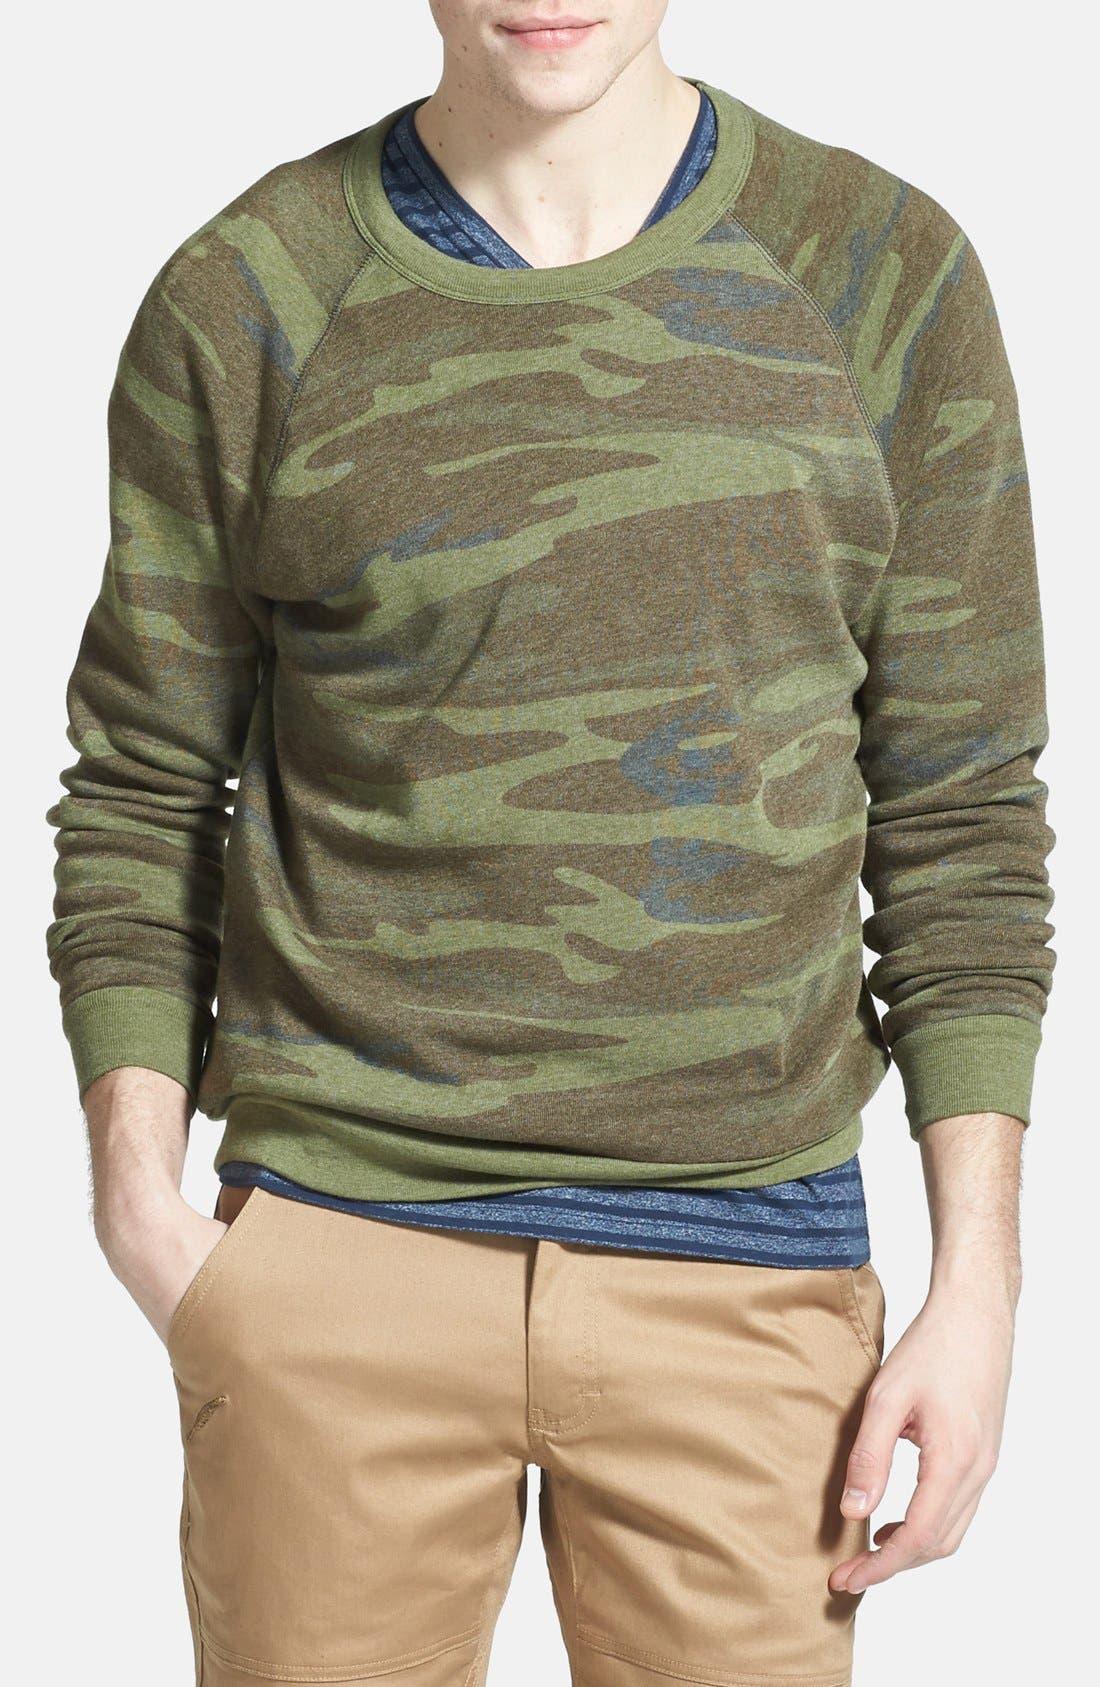 'The Champ' Camo Print Crewneck Sweatshirt,                         Main,                         color, Camo